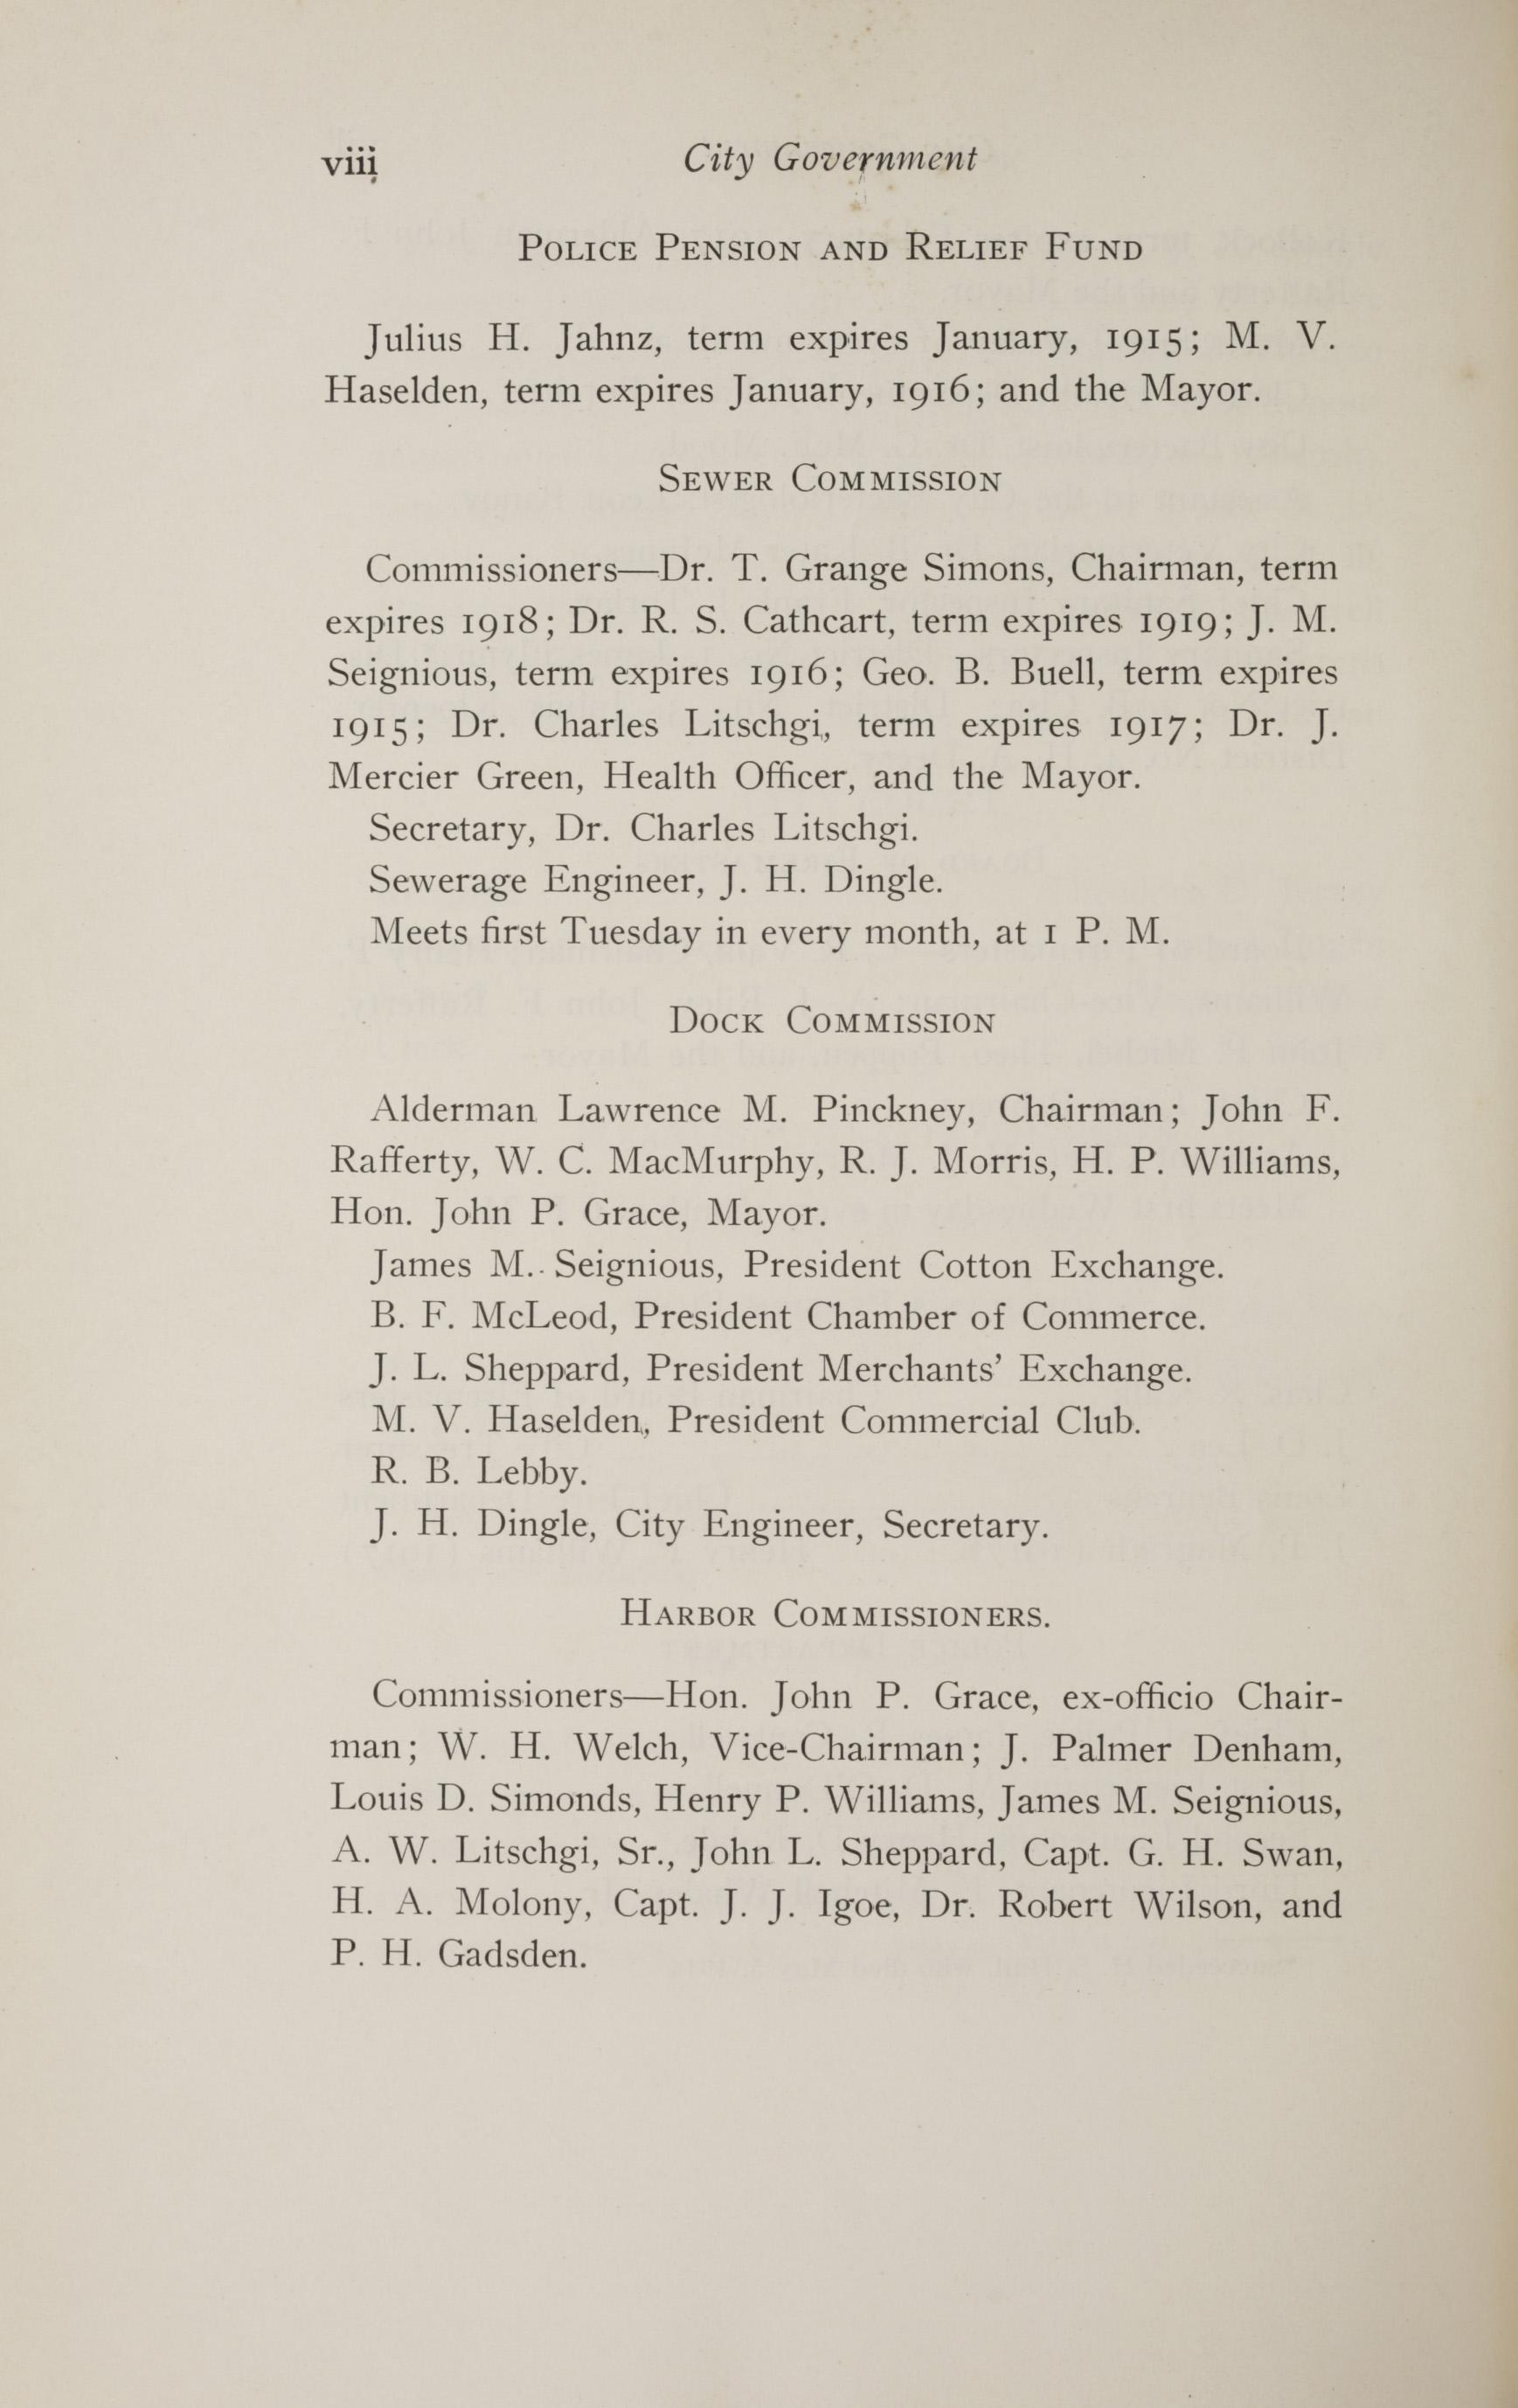 Charleston Yearbook, 1914, page viii